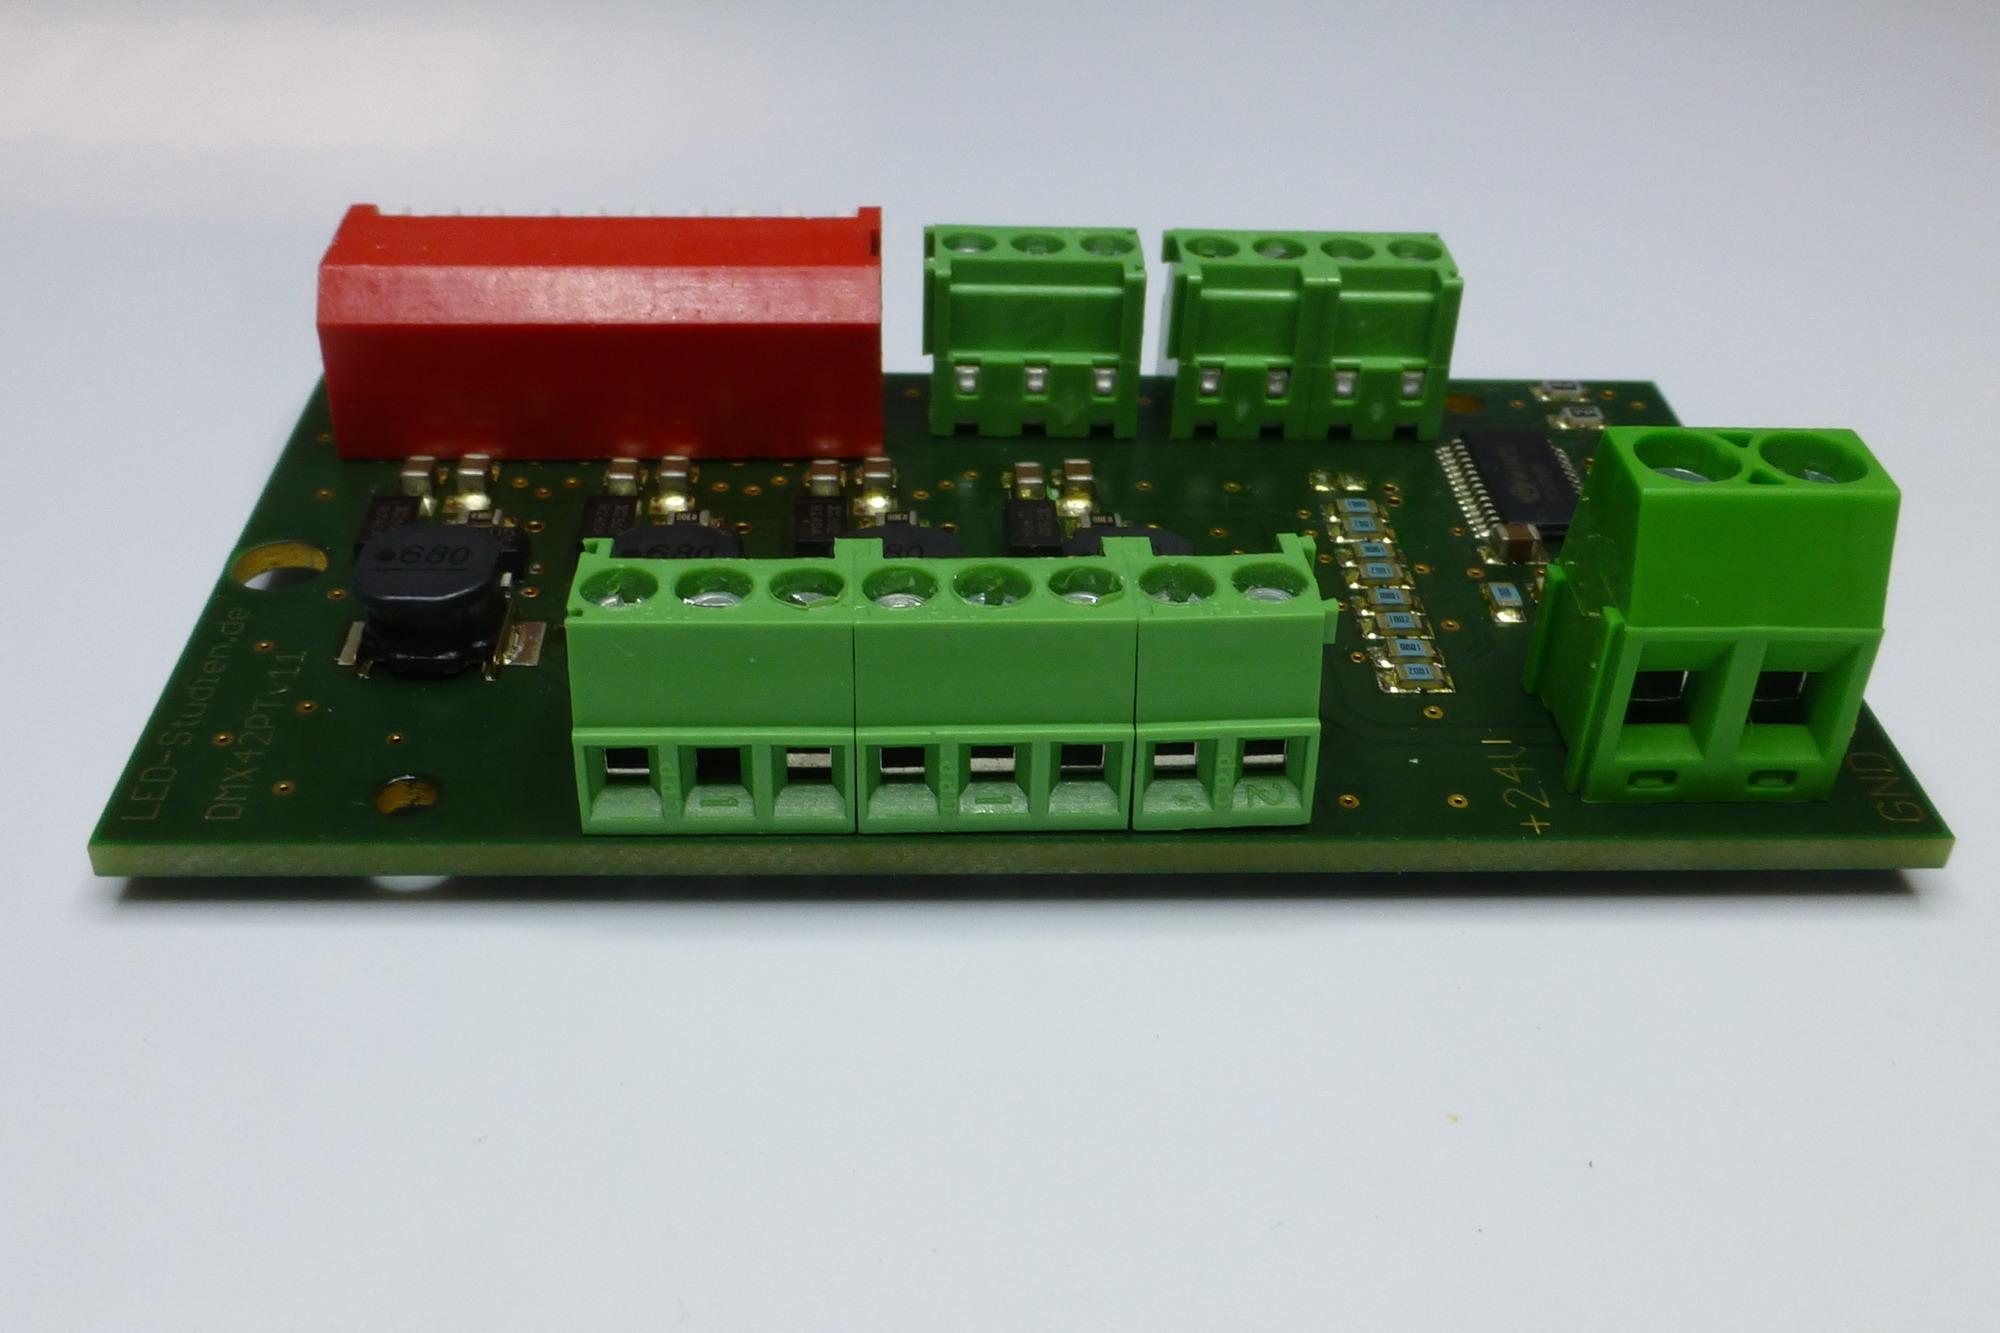 4 kanal dmx led controller my9942 mit 300 1200ma ksq for Koch 4 kanal led funkfernsteuerung